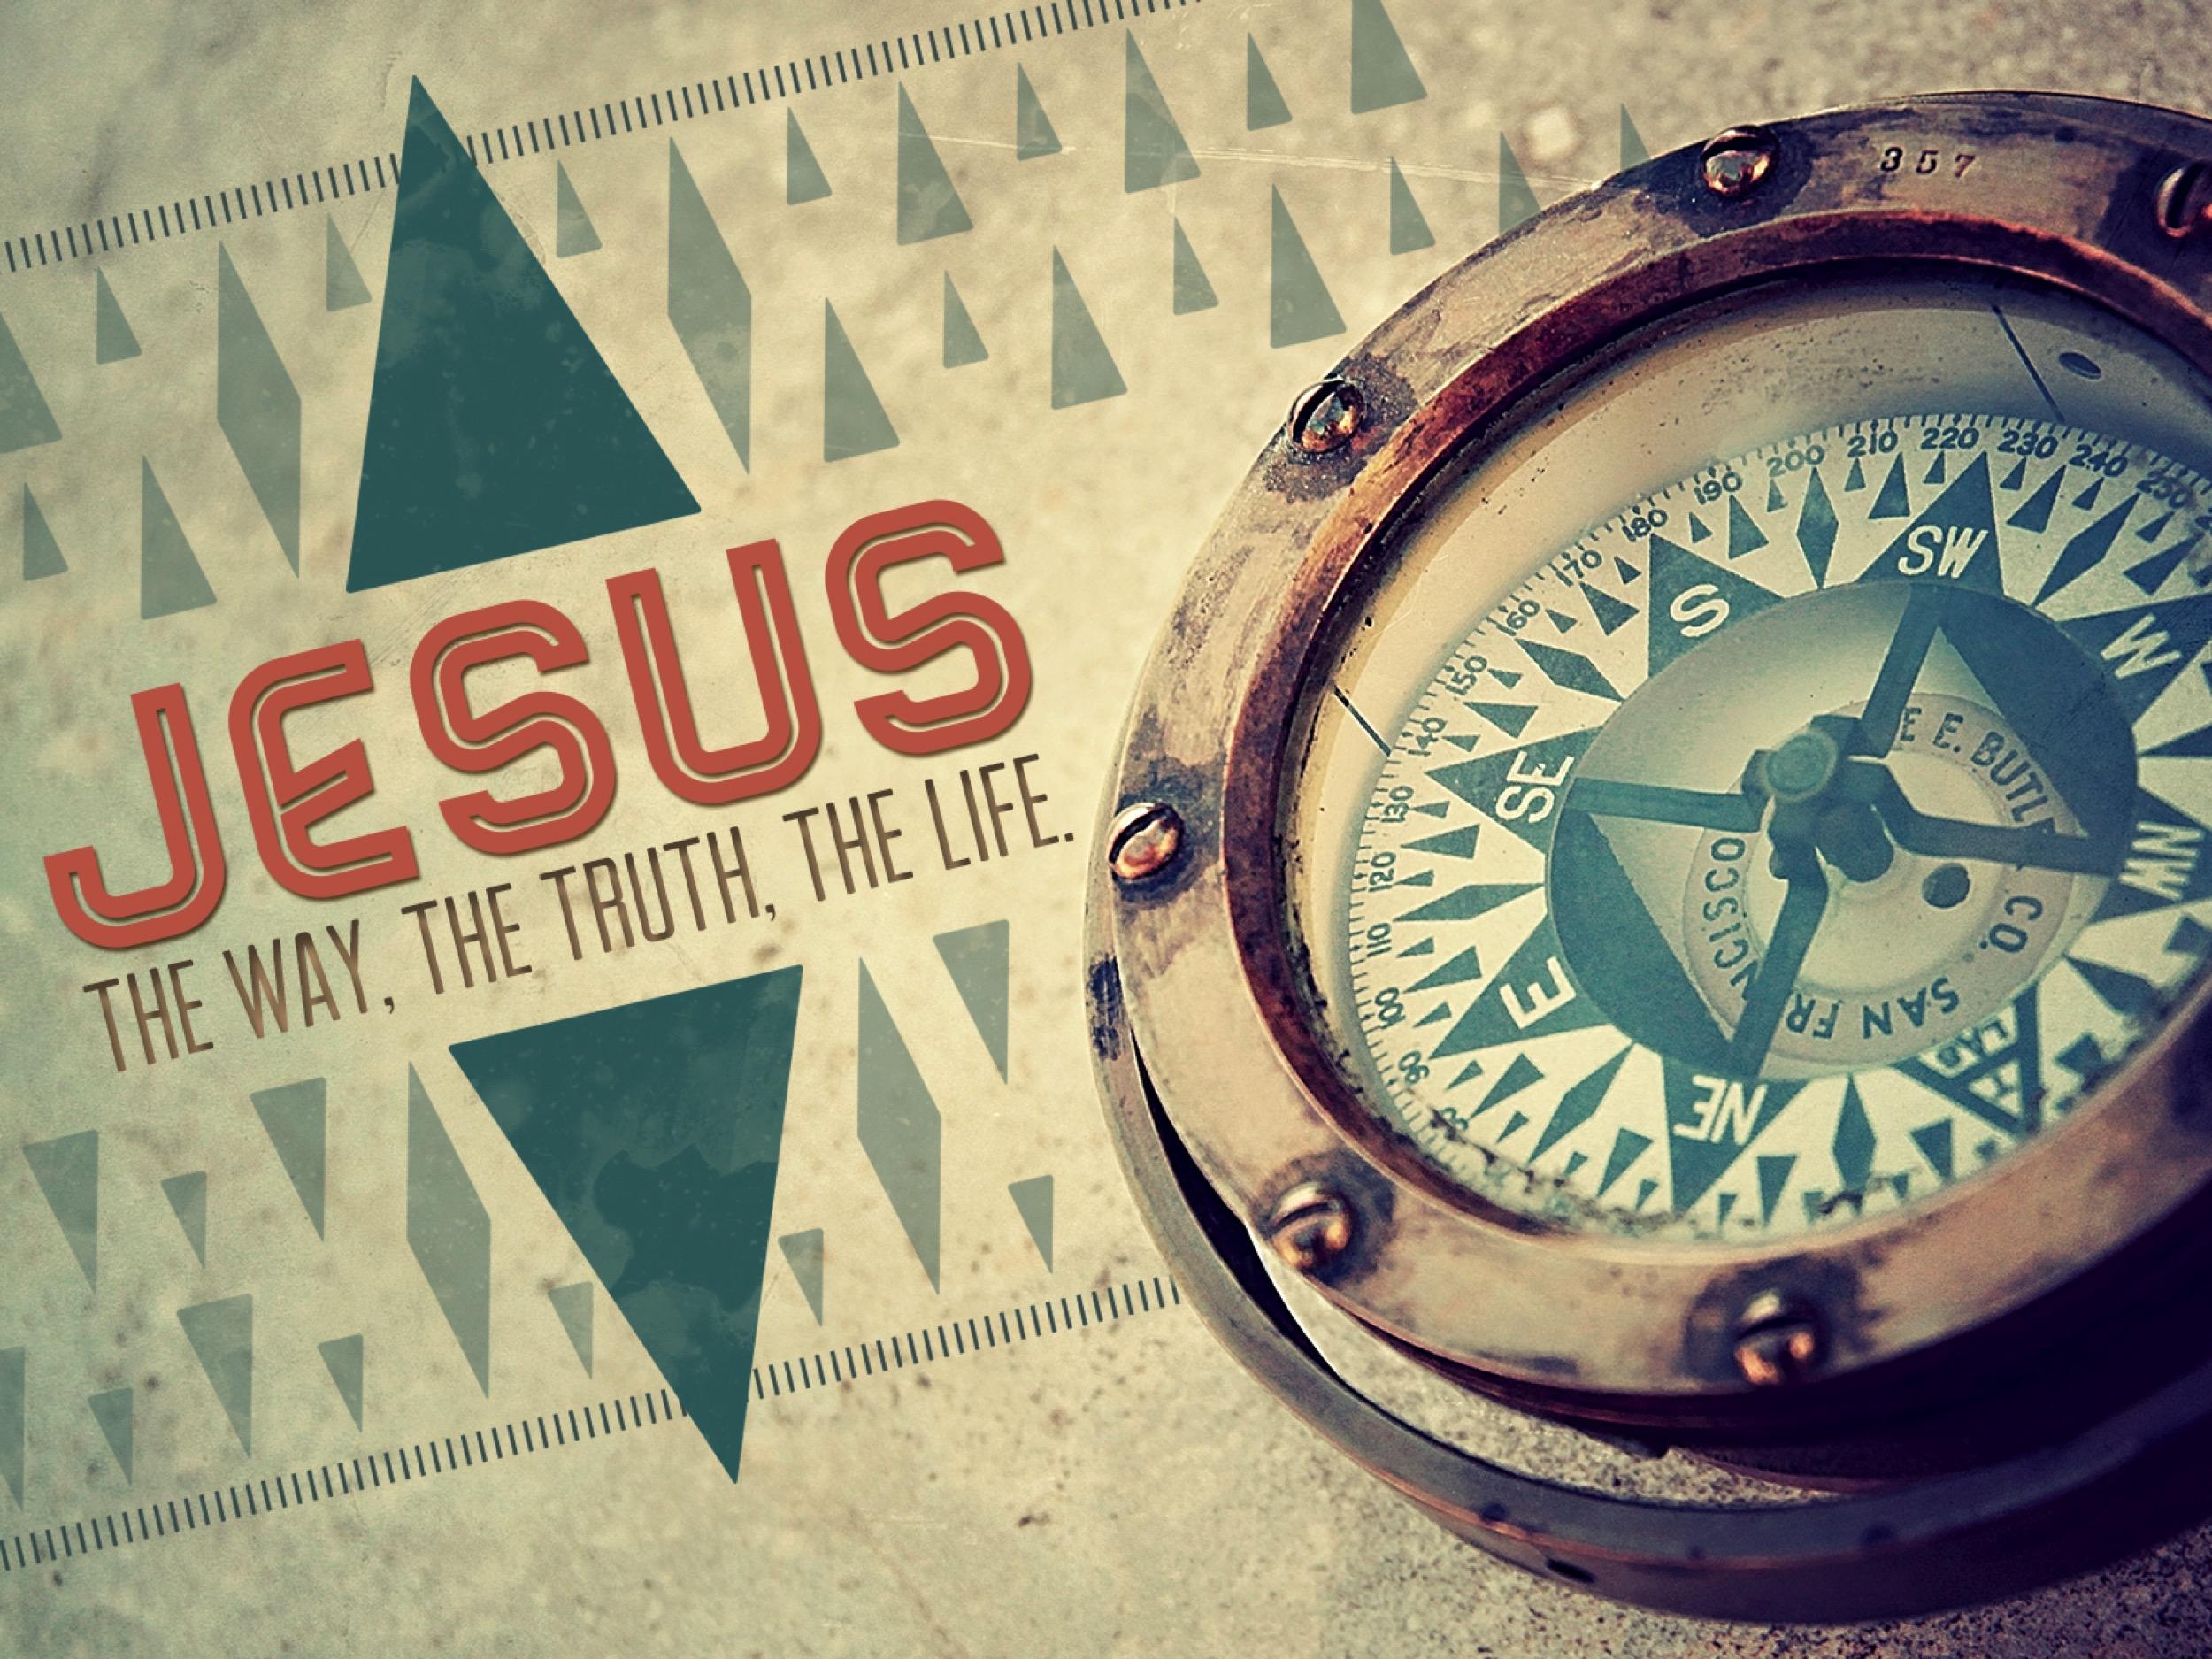 The Life Of Jesus P5